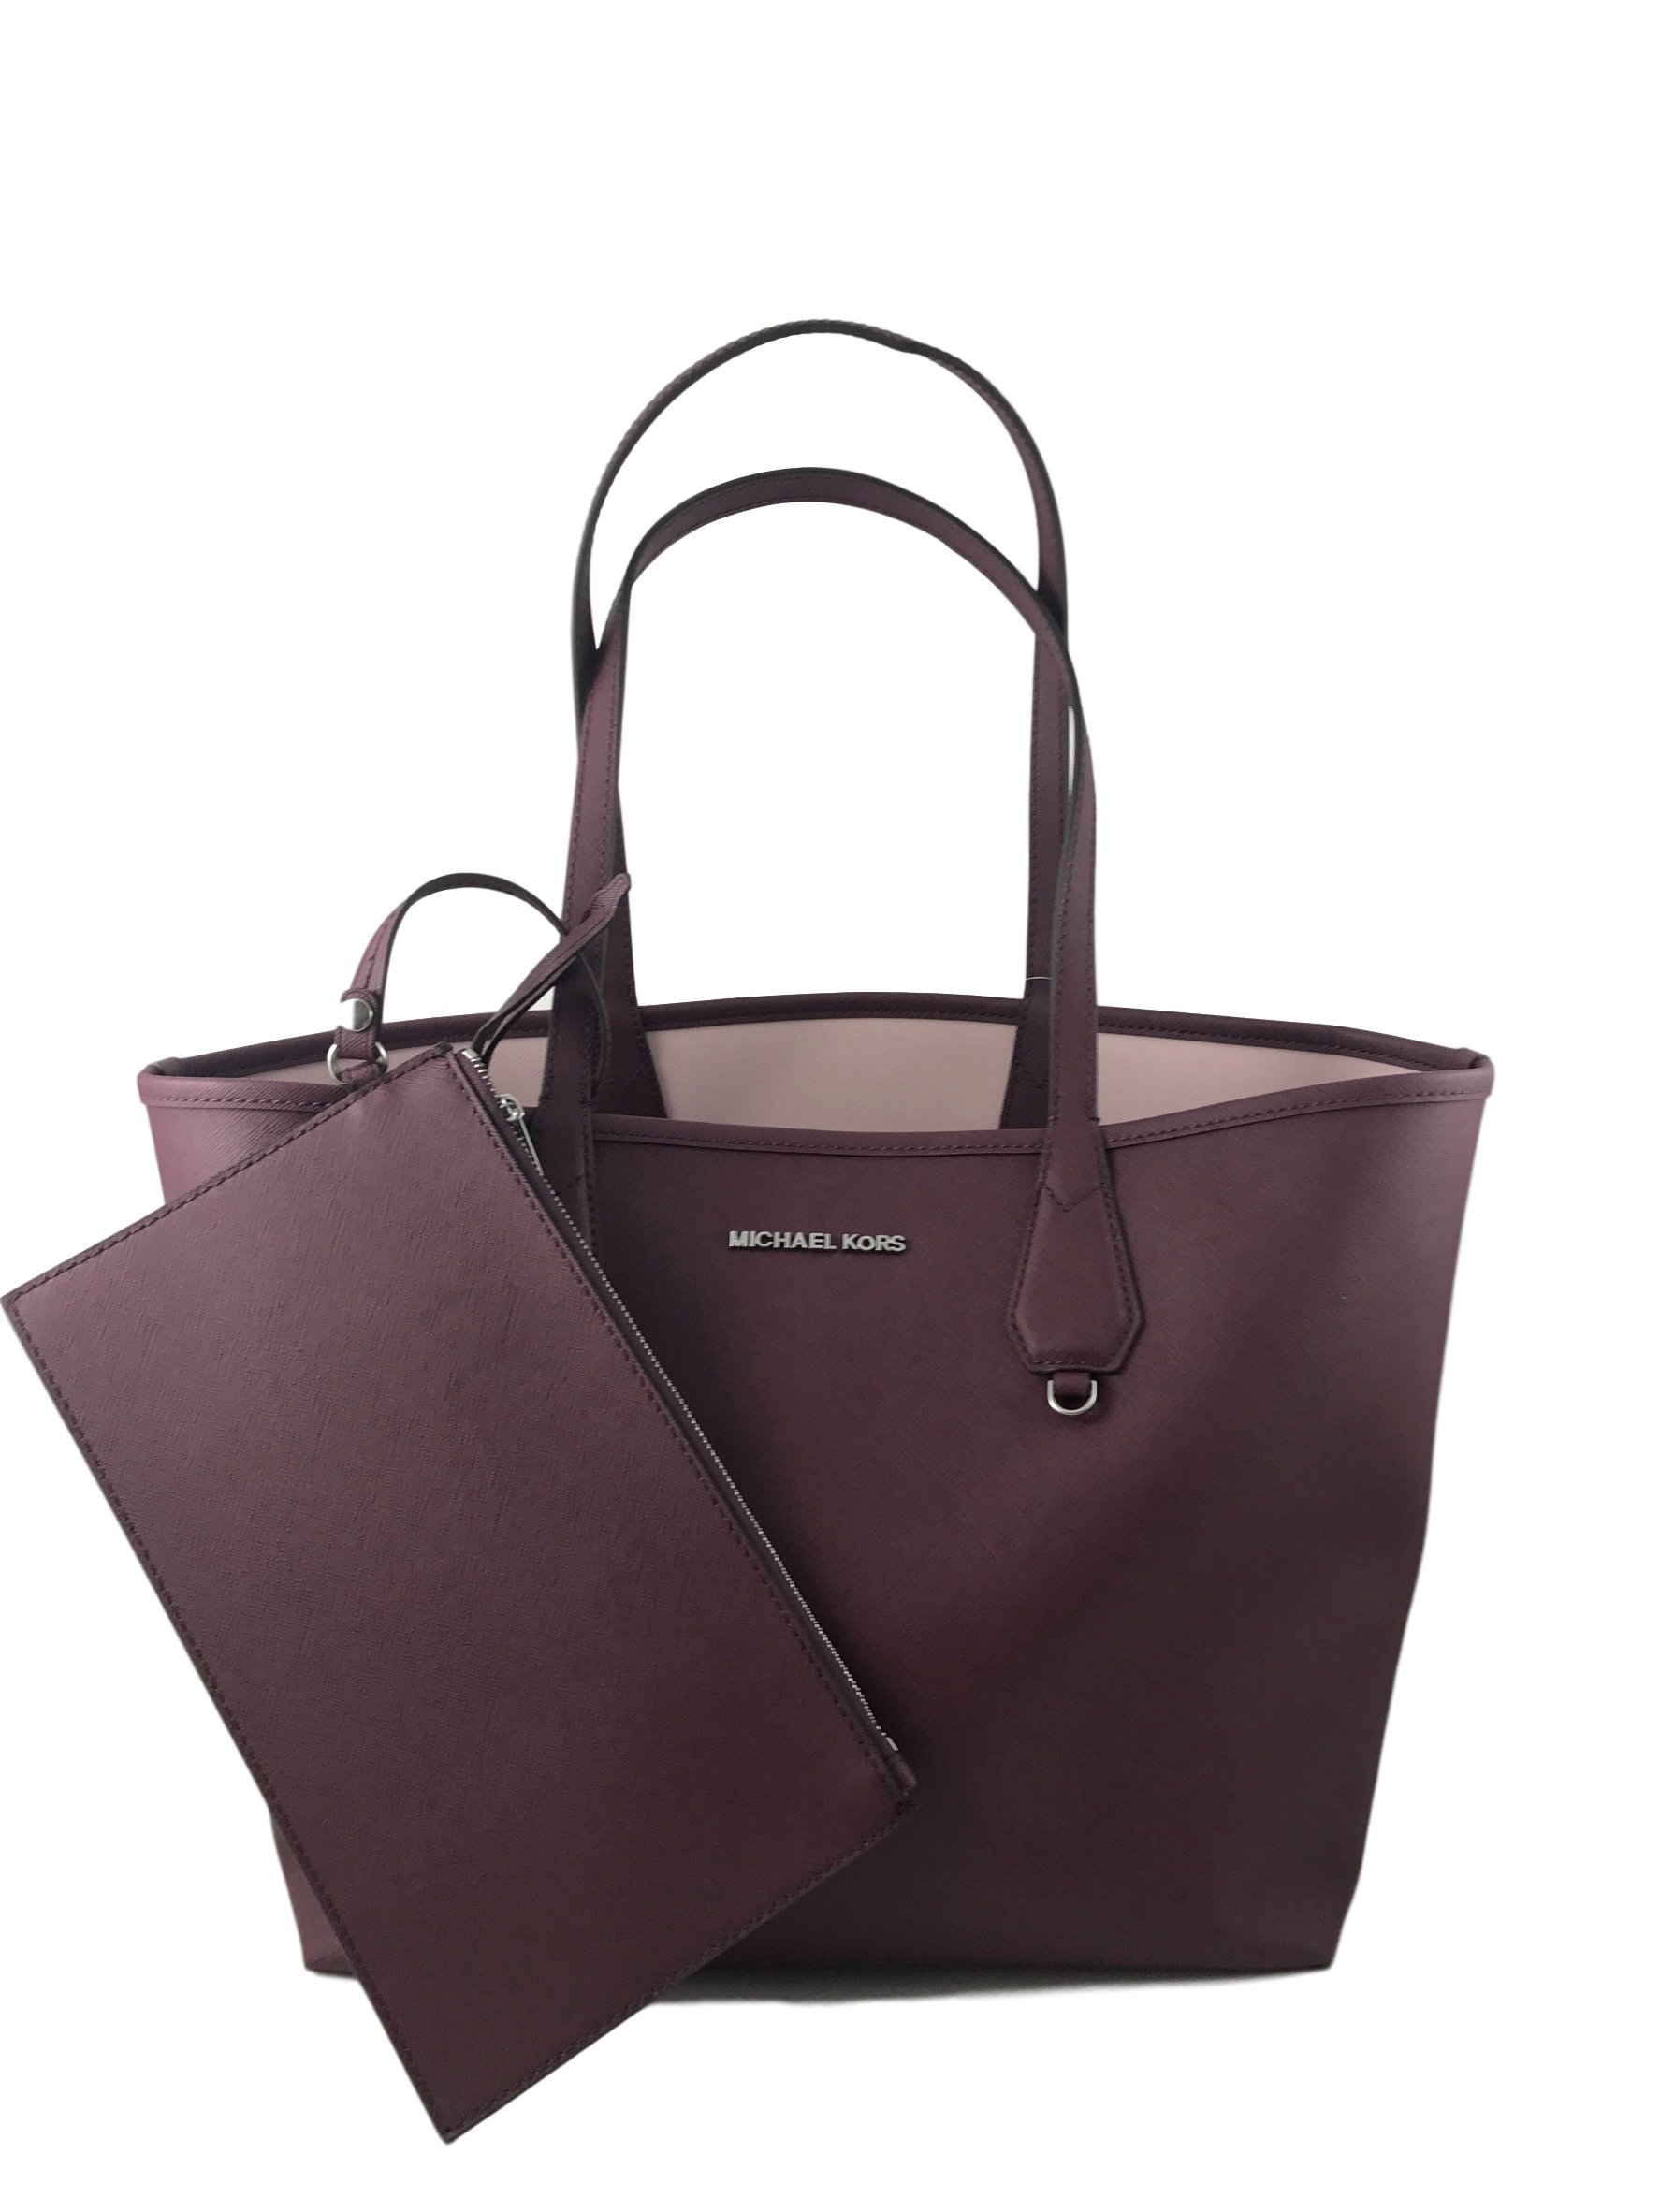 Michael Kors Candy LG Reversible PVC Tote Bag Plum/Blossom